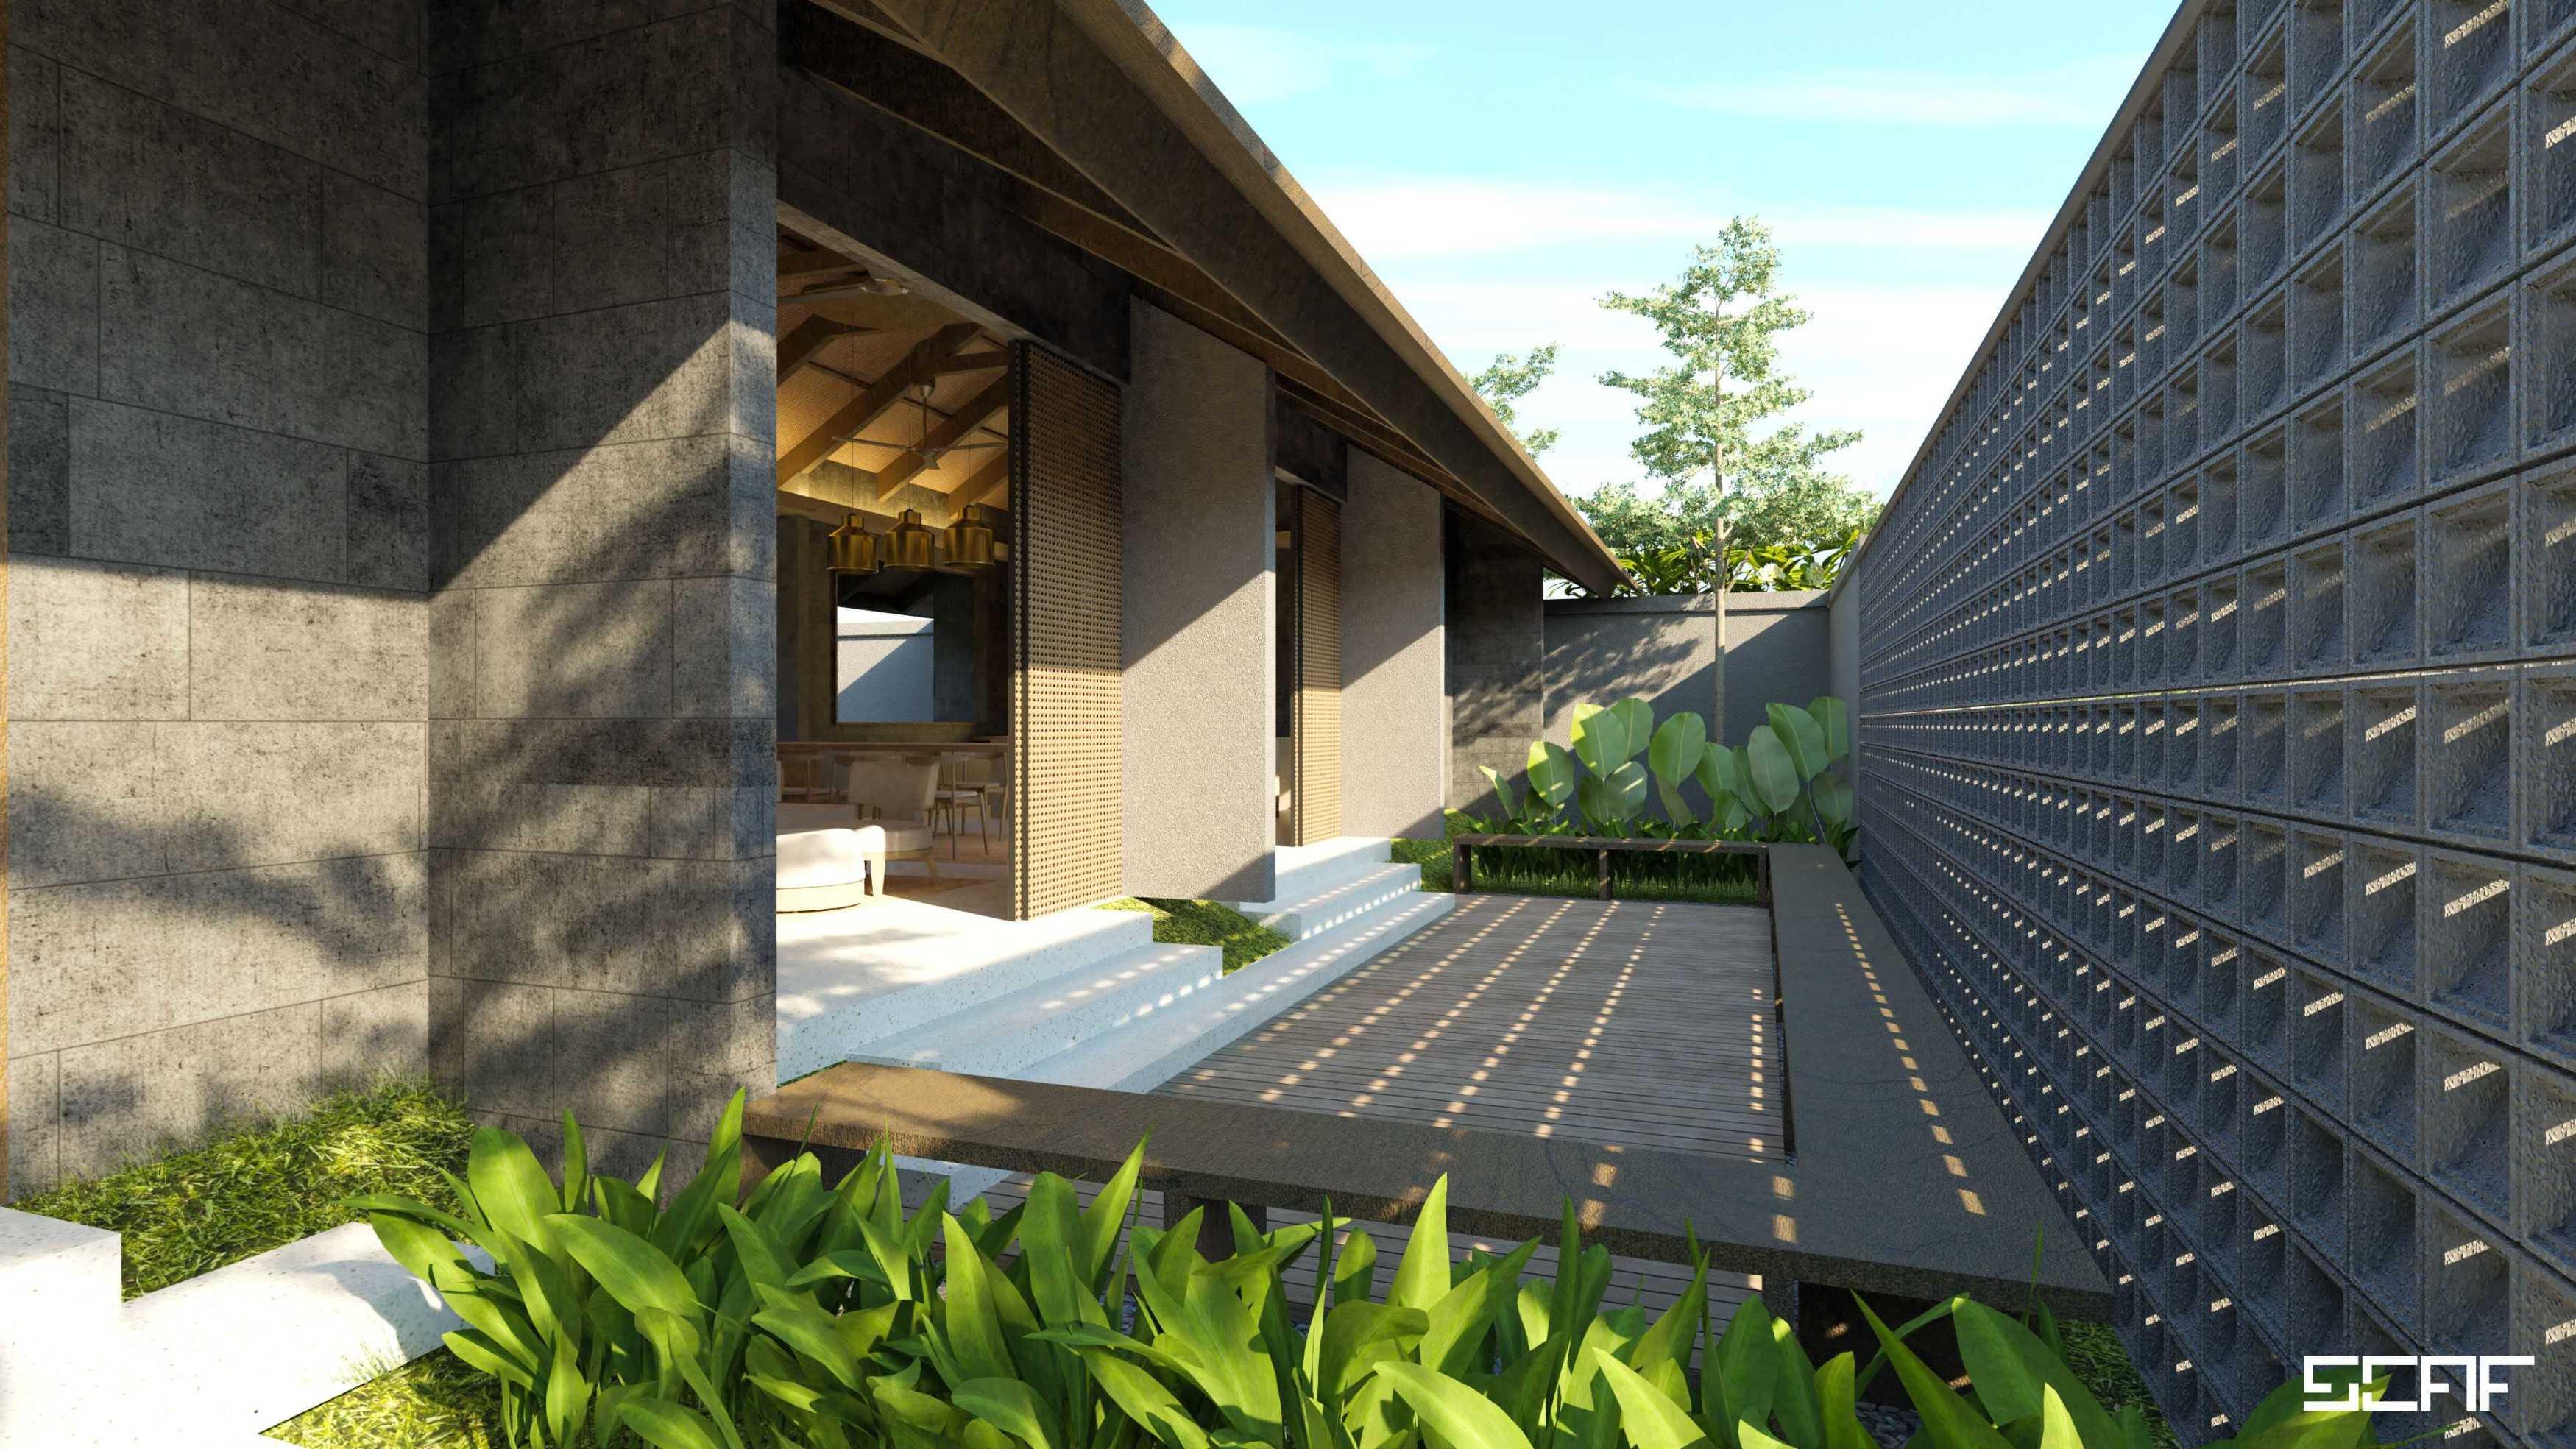 Scaf Studio Villa Rayung Cisarua, Kec. Cisarua, Bogor, Jawa Barat, Indonesia Cisarua, Kec. Cisarua, Bogor, Jawa Barat, Indonesia Scaf-Studio-Villa-Rayung   121761